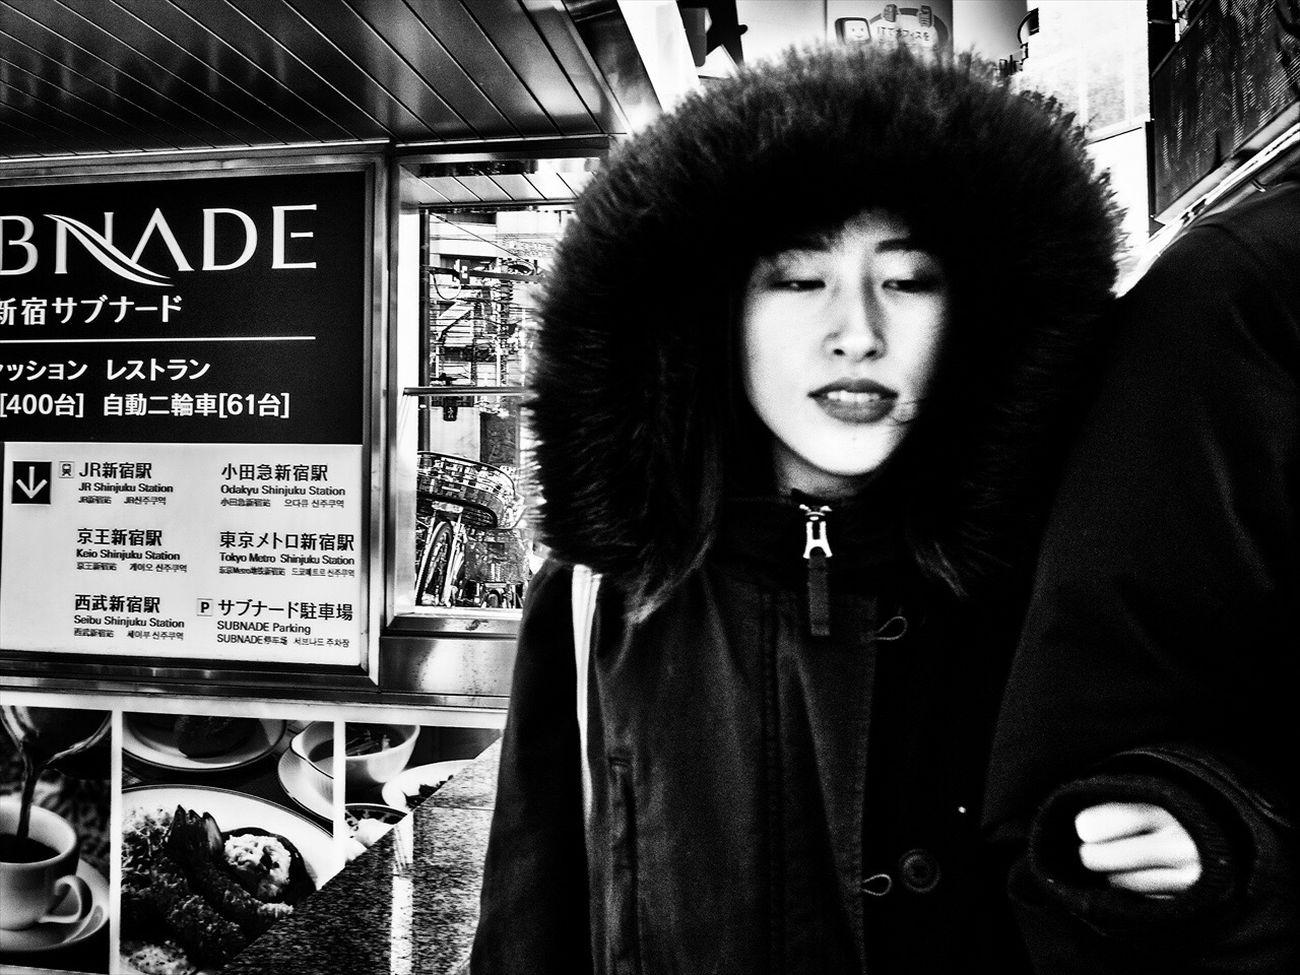 Street Streetphotographers SHINJYUKU Streetphotographer Streetphoto_bw Streetphoto Shibuya Tokyo Streetphotography Sting_the_street